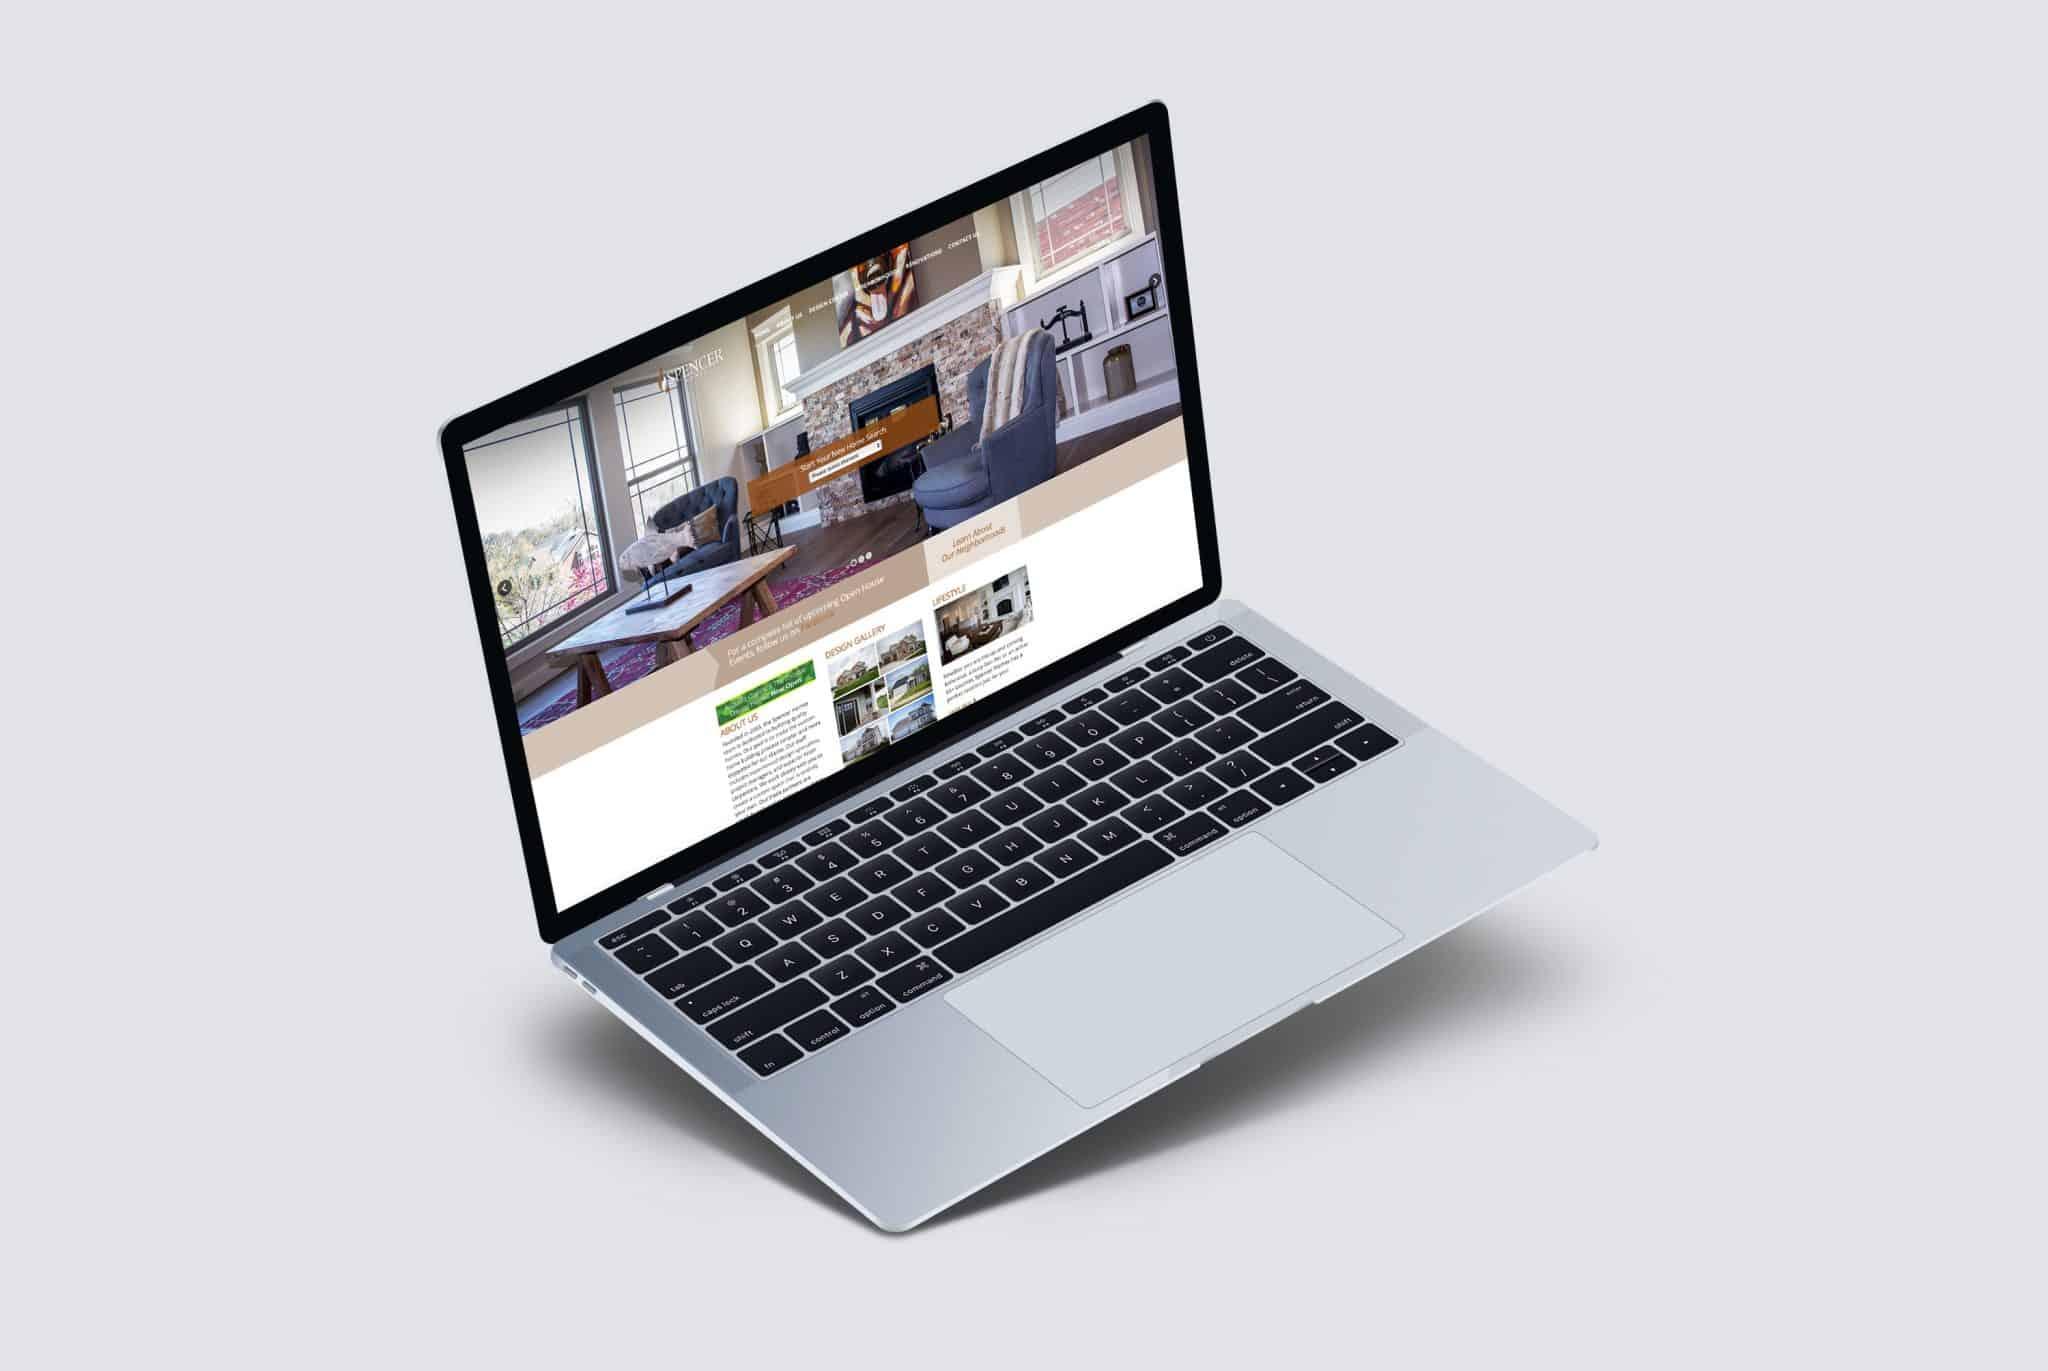 Spencer Homes website pulled up on a laptop